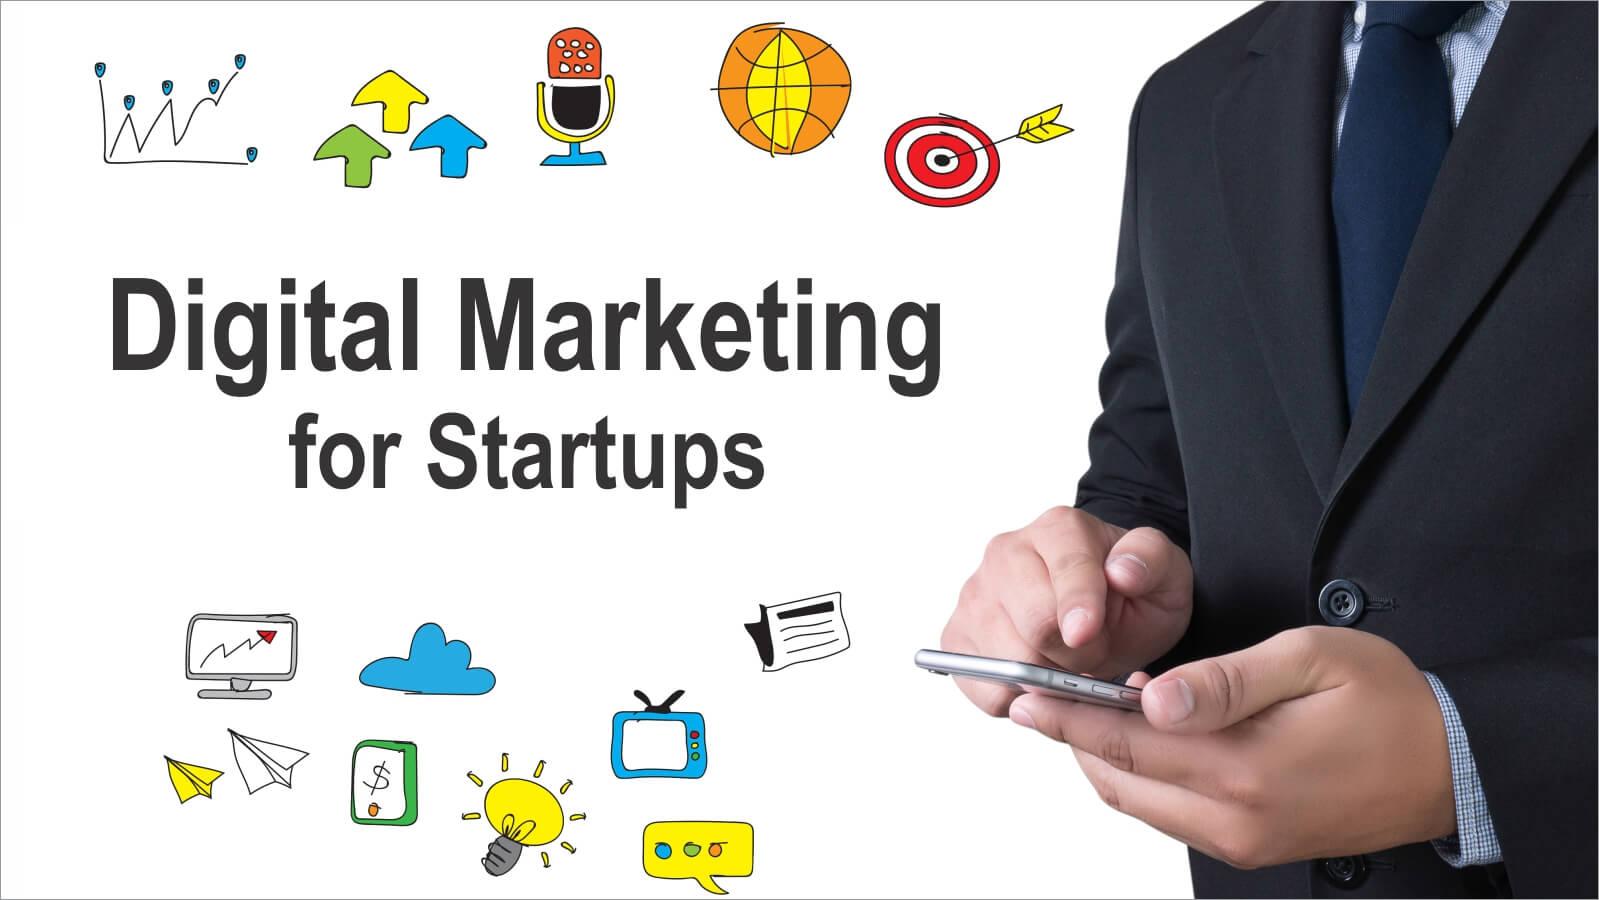 startups Invest in Digital Marketing